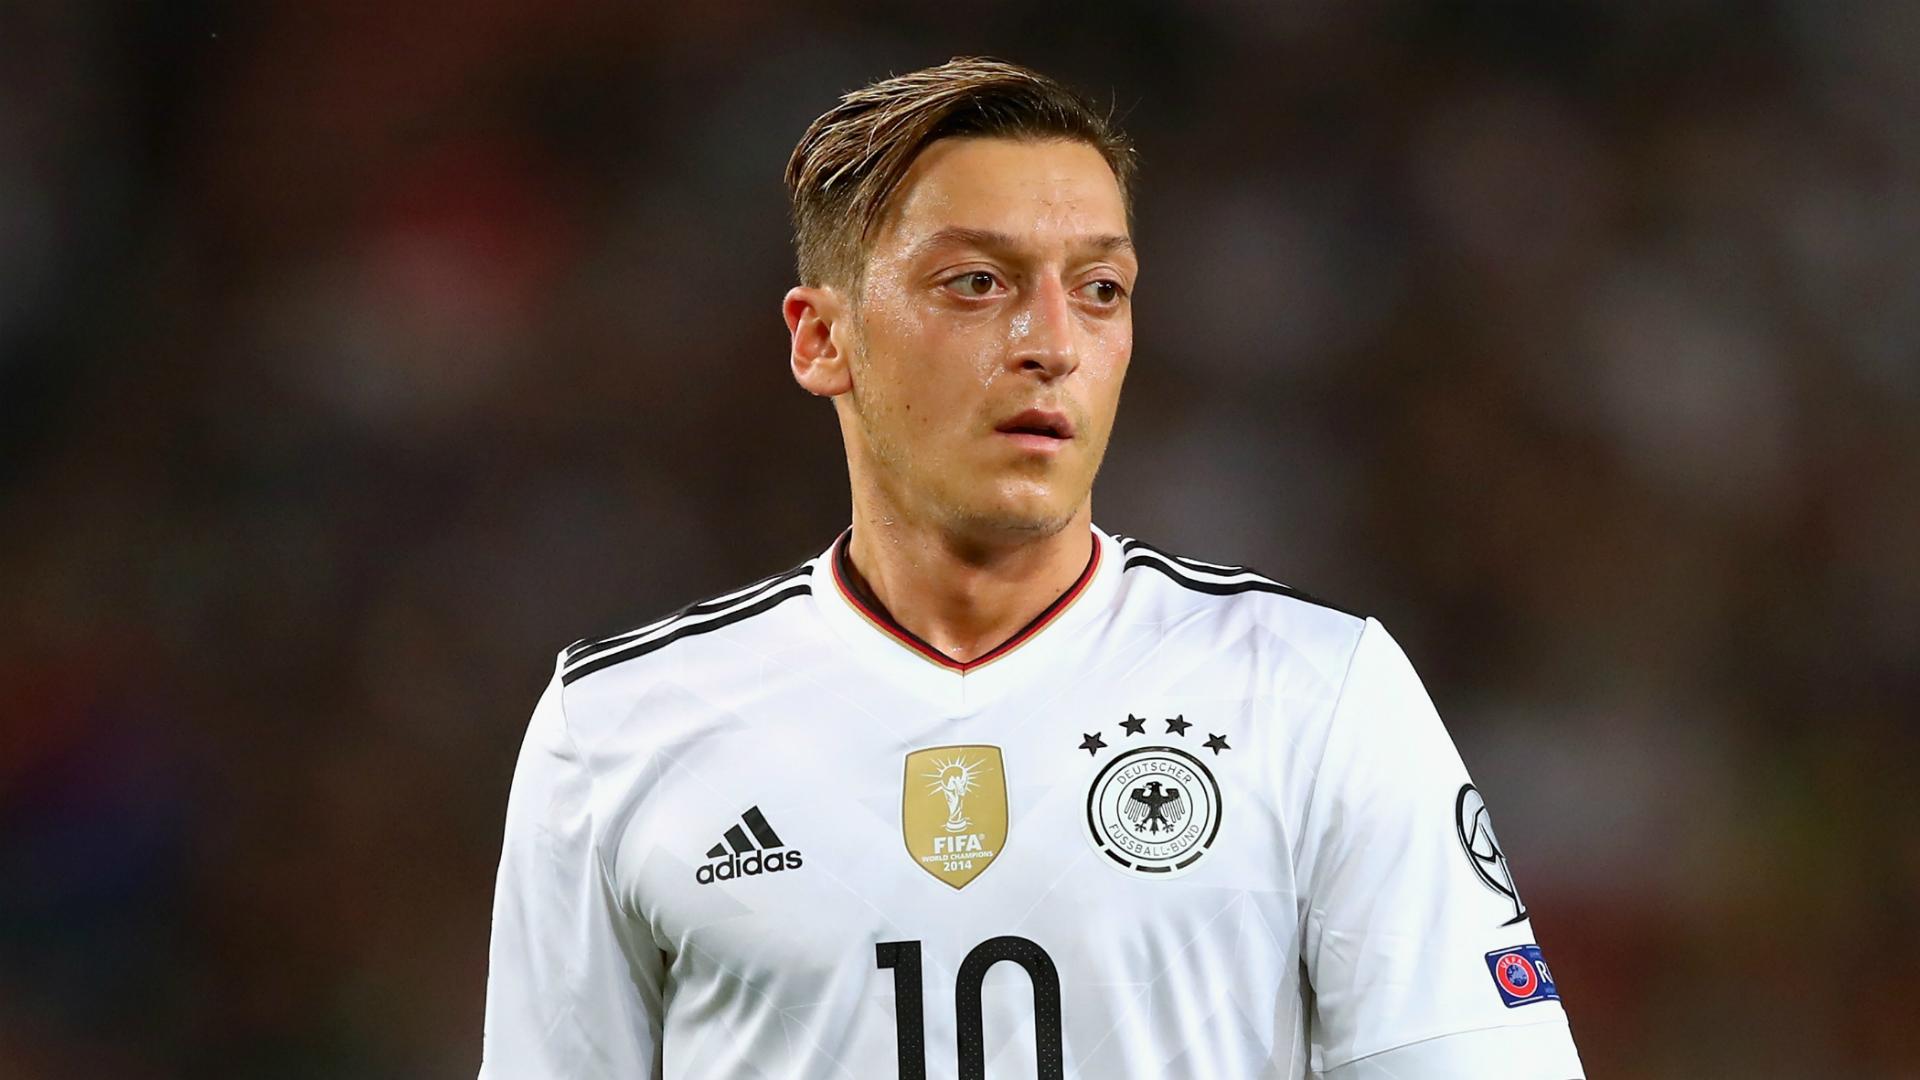 Arsene Wenger confirms €100m Thomas Lemar bid, plans another offer